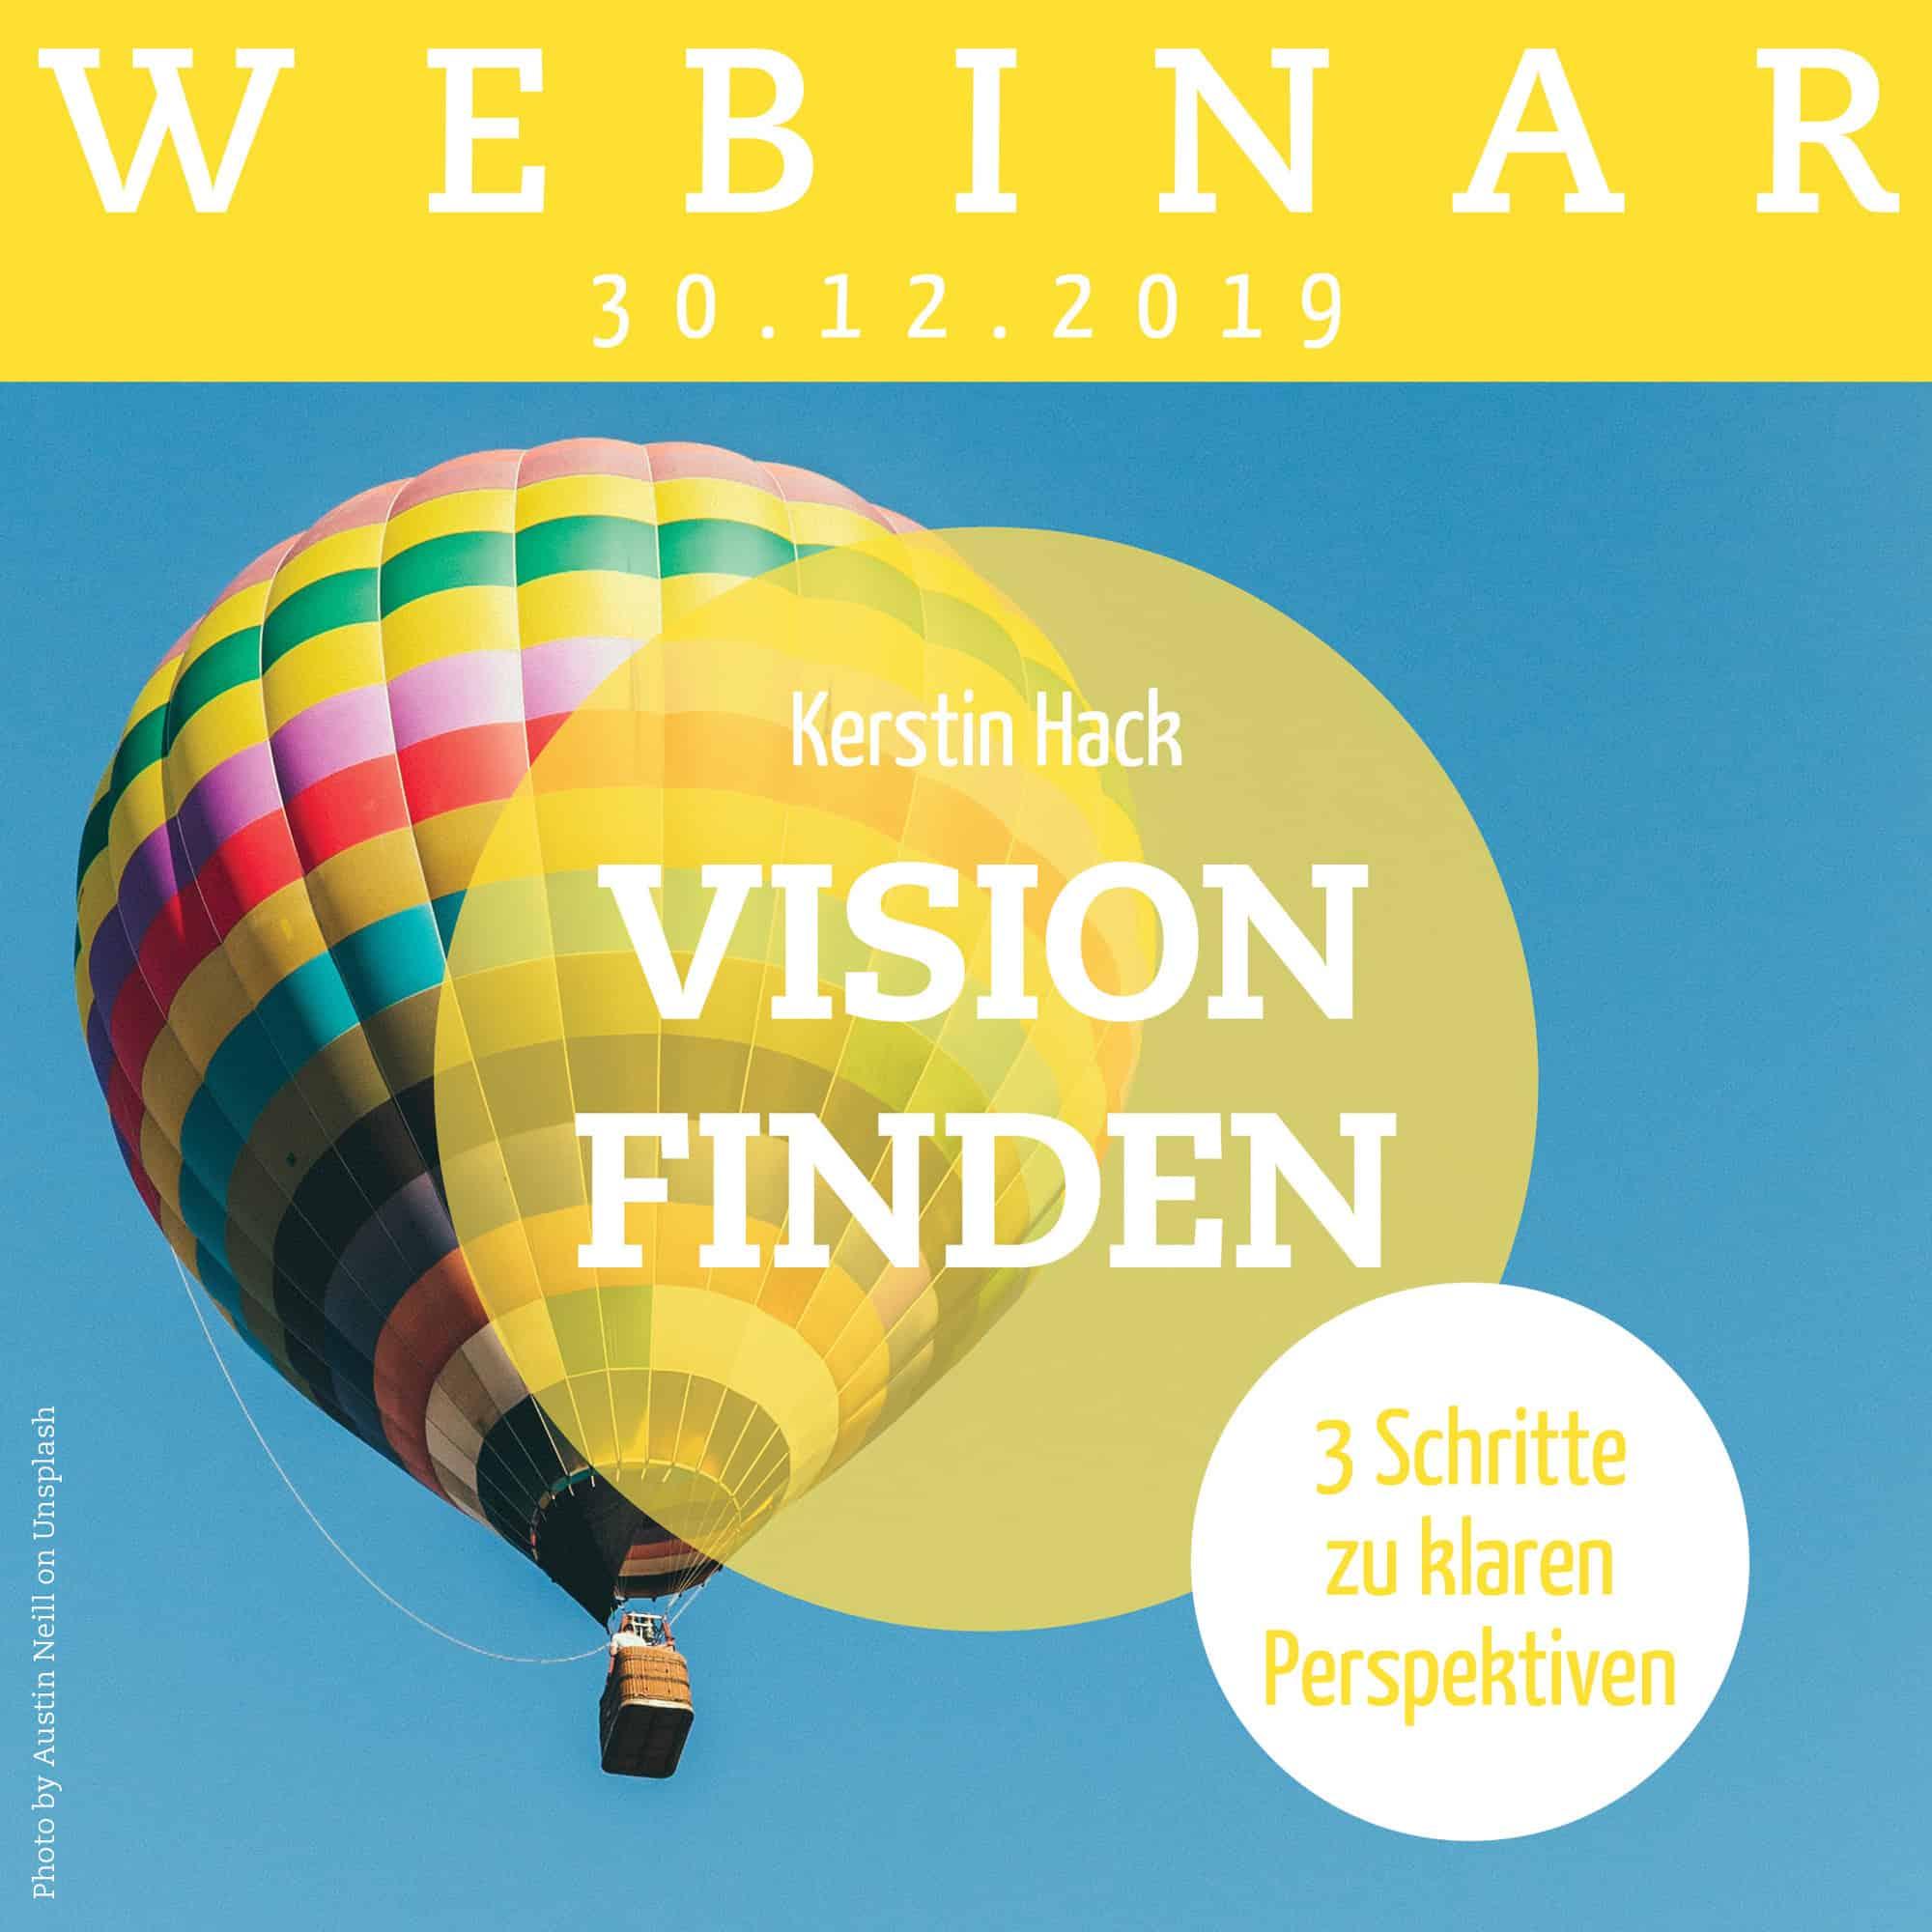 Webinar mir Coach Kerstin Hack: Vision finden. Am 18.12.